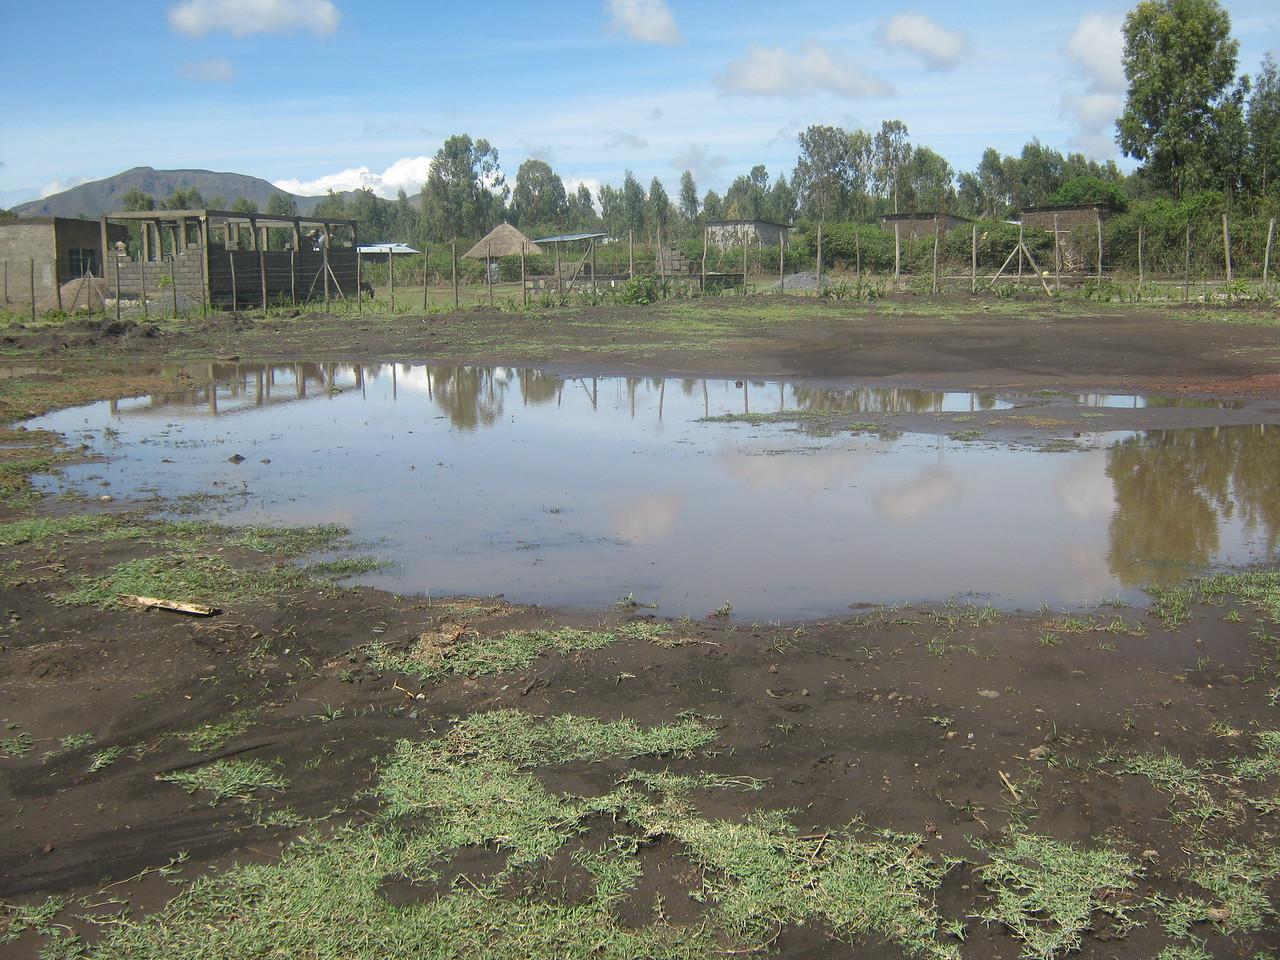 Waterlogged school grounds during the rainy season.